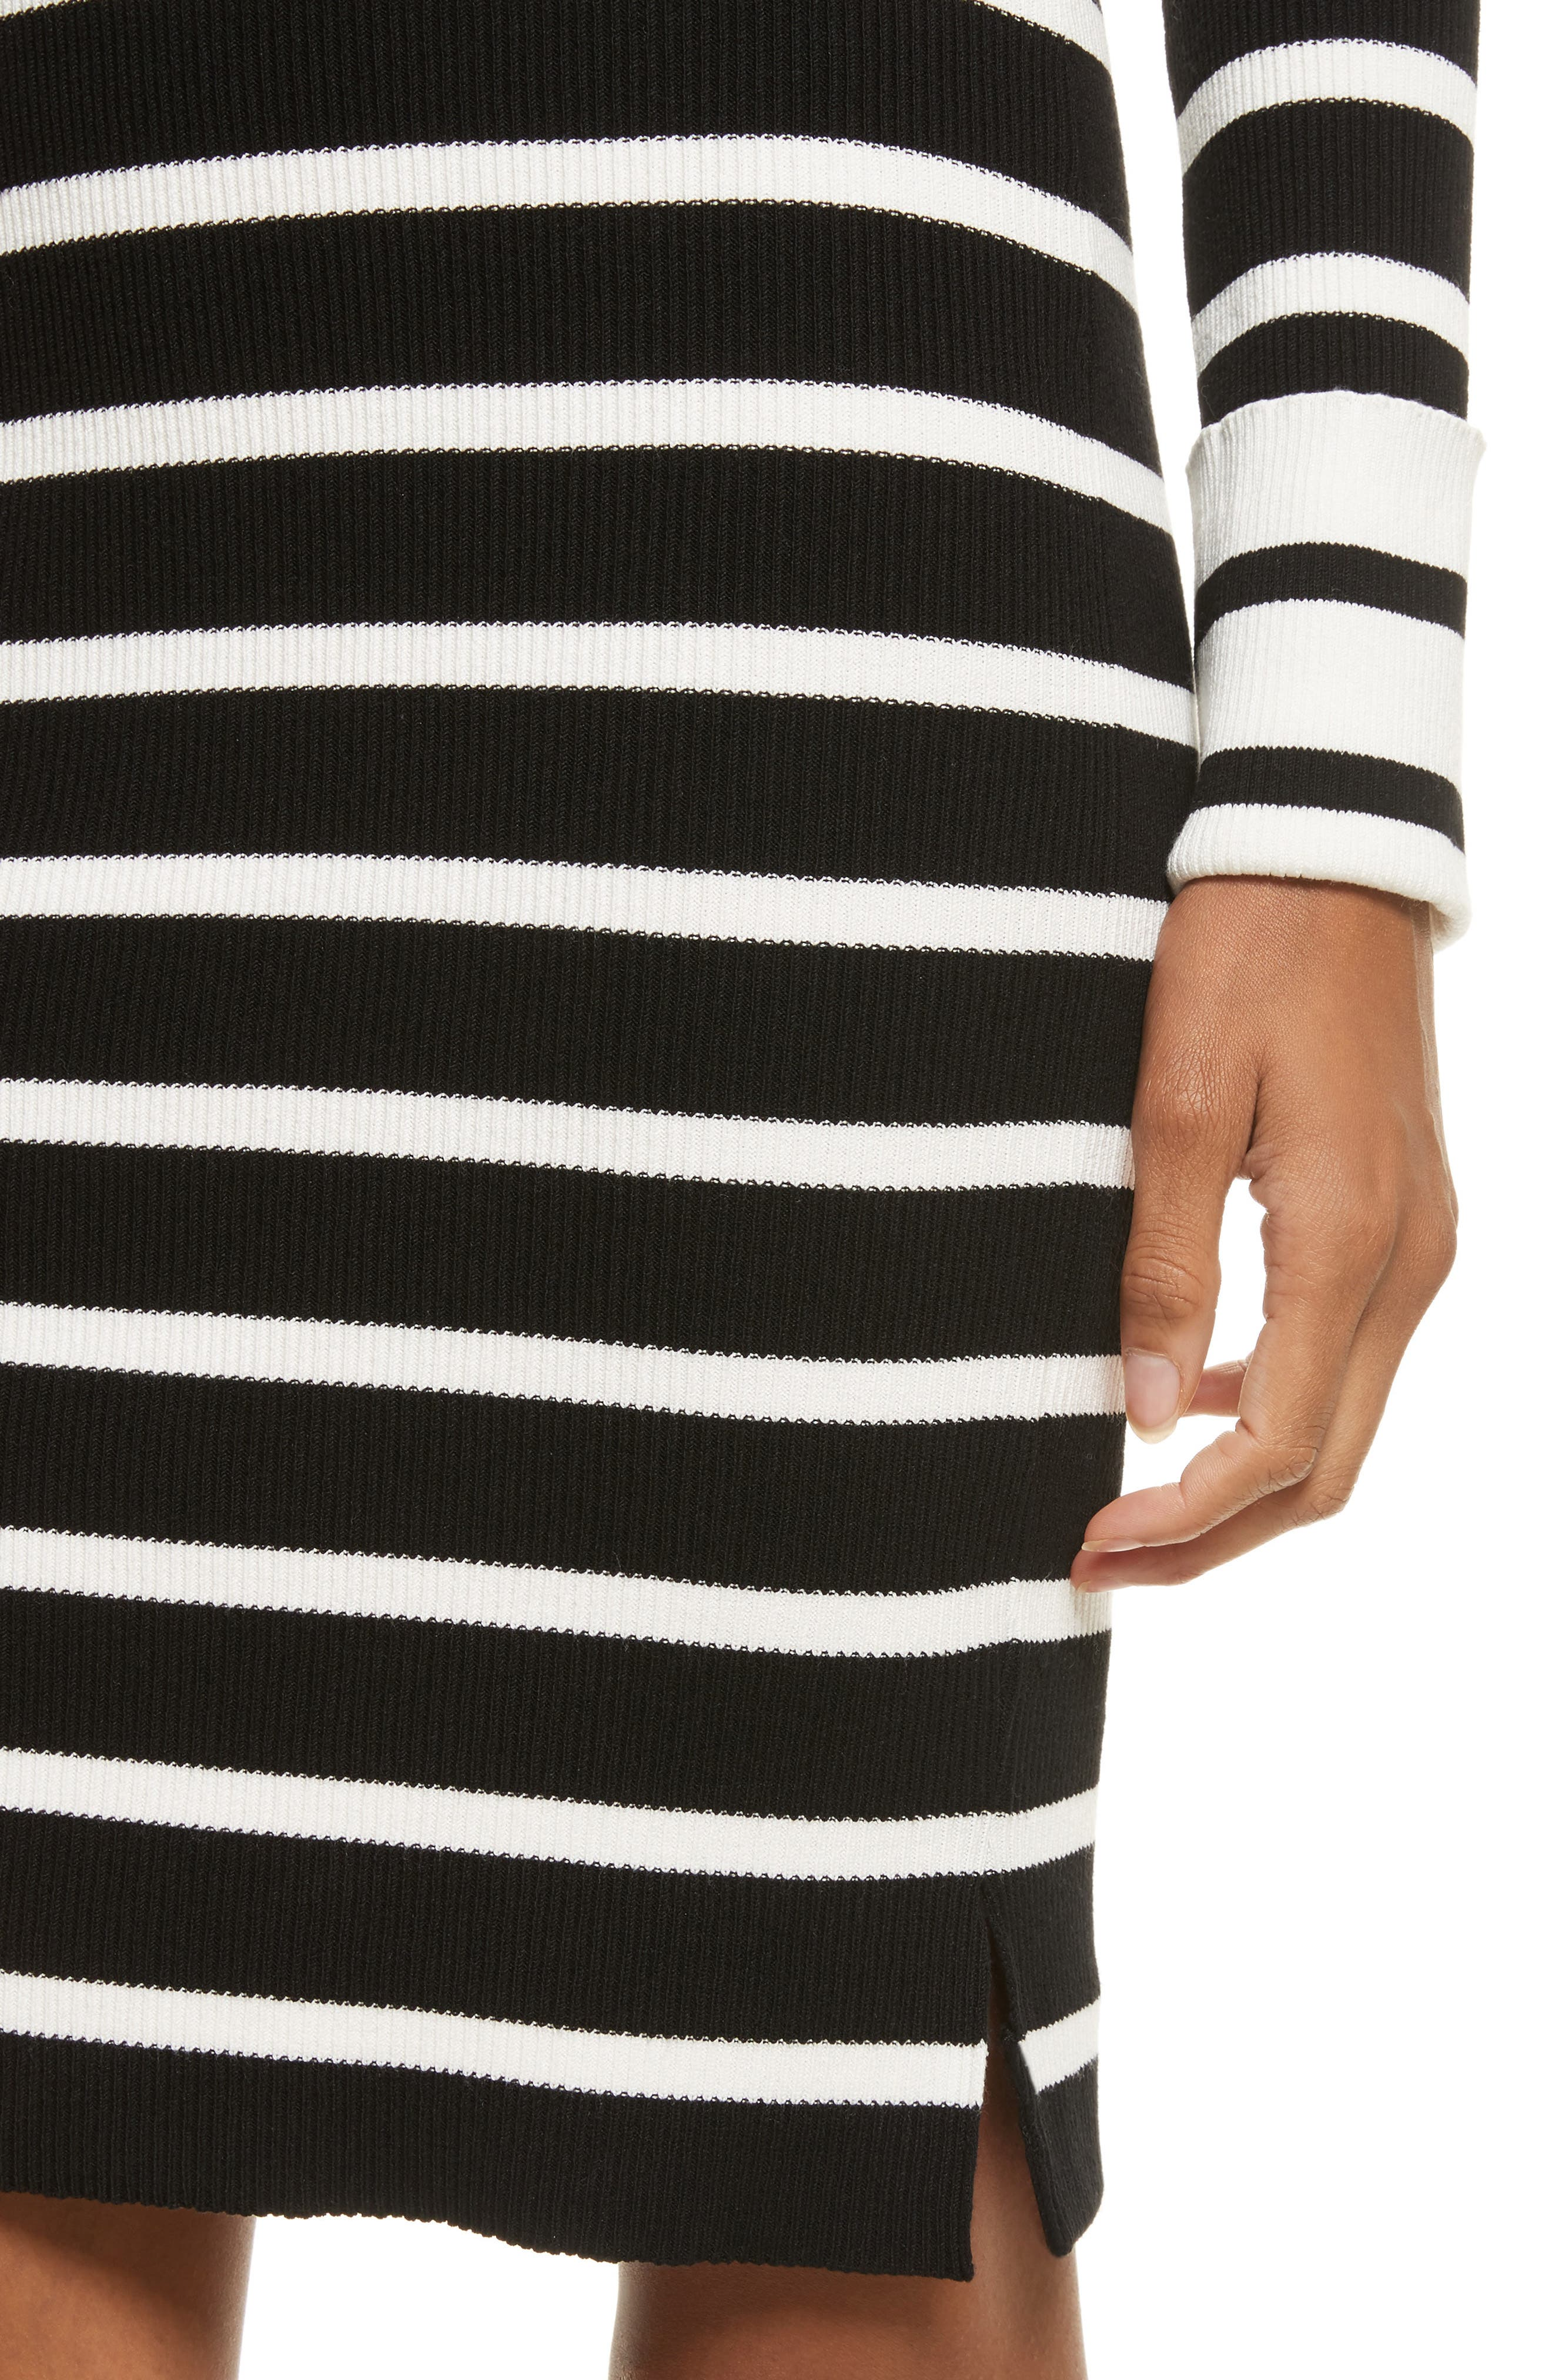 Prosecco Stripe Knit Dress,                             Alternate thumbnail 4, color,                             016